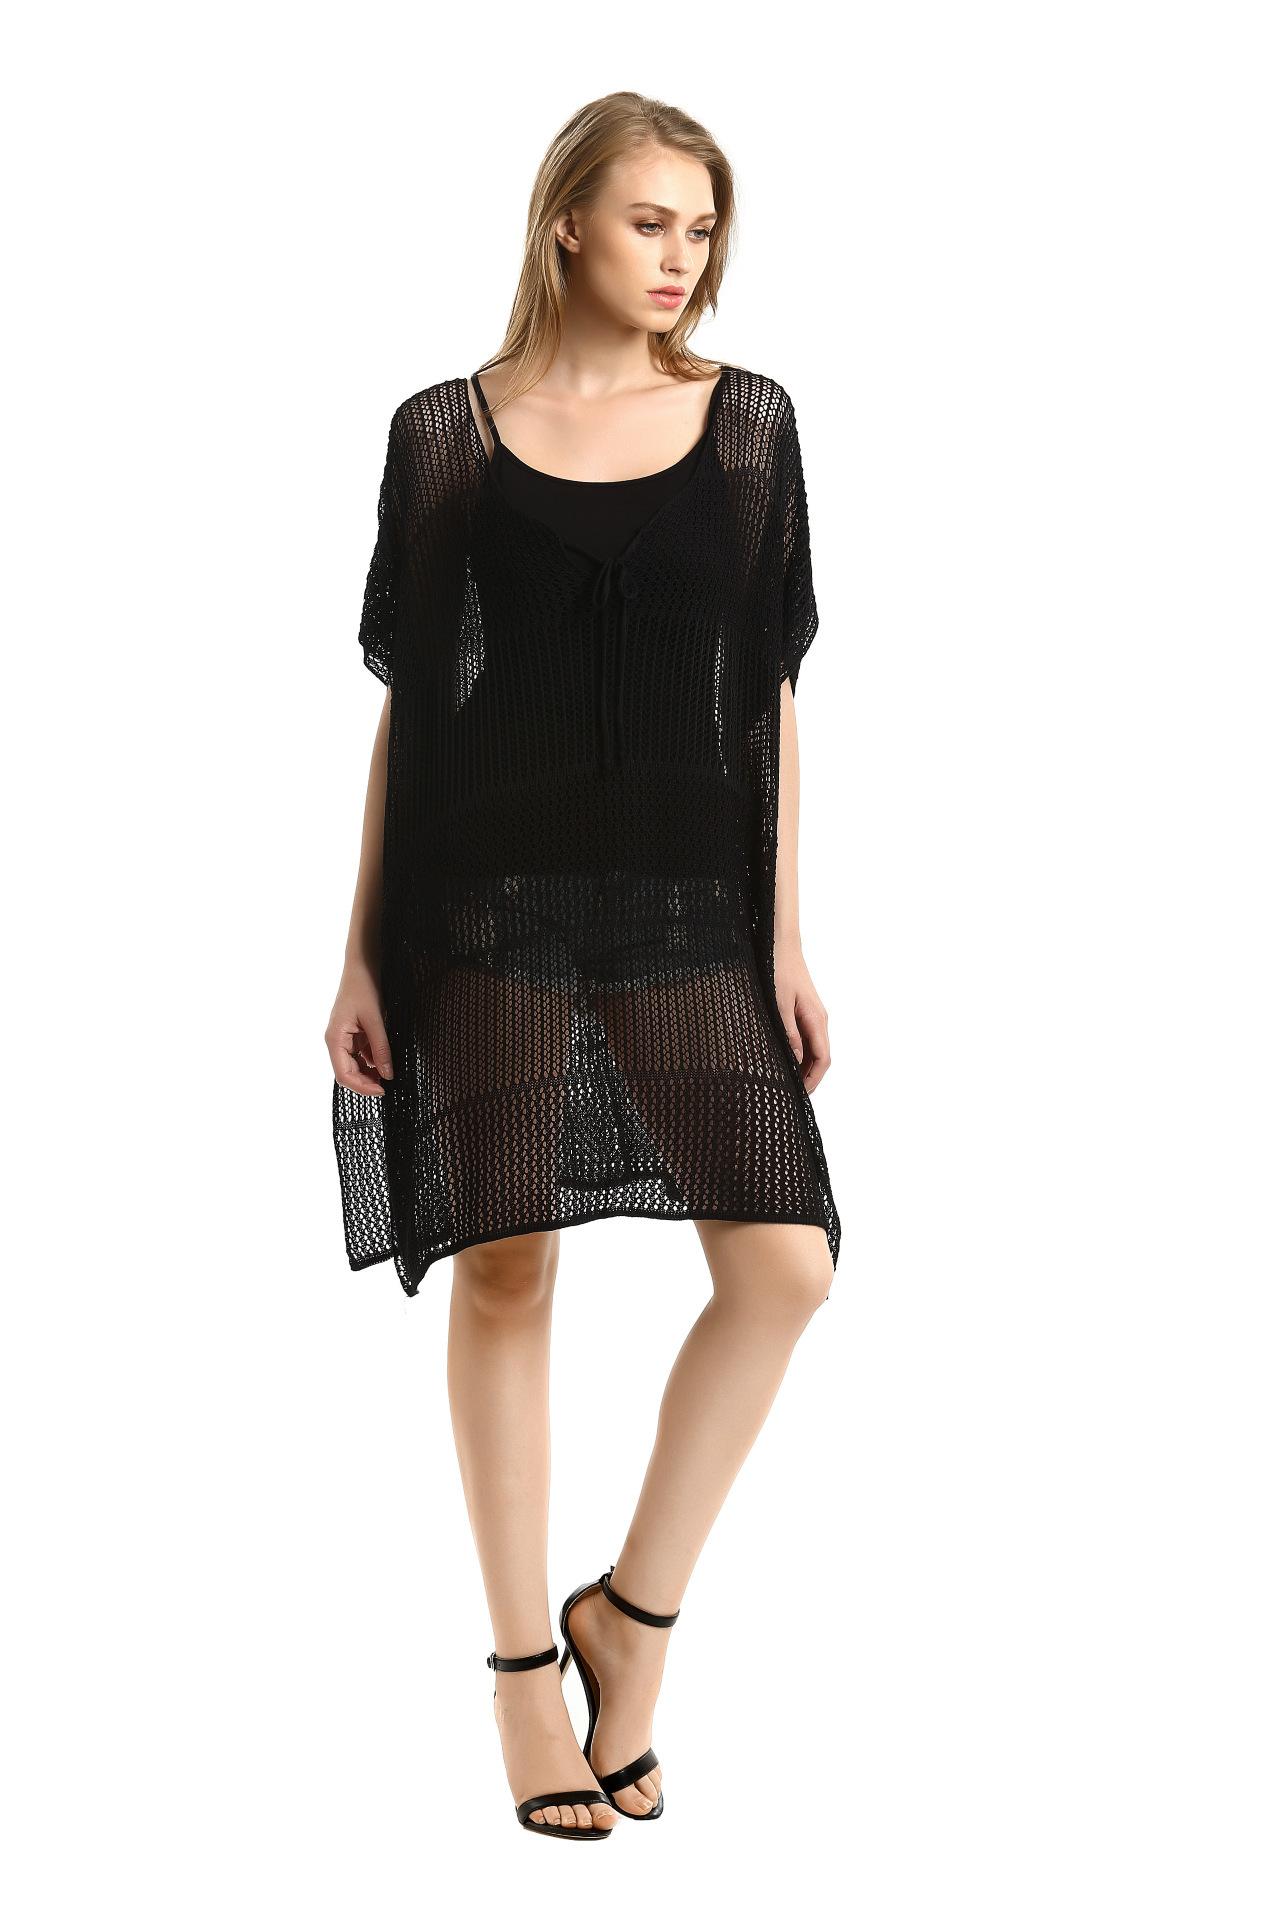 17 New Knitted Crochet Beach Tunic Bandage Bikini Cover-Ups Sexy Swimwear Cover up Women Beach Dress 7